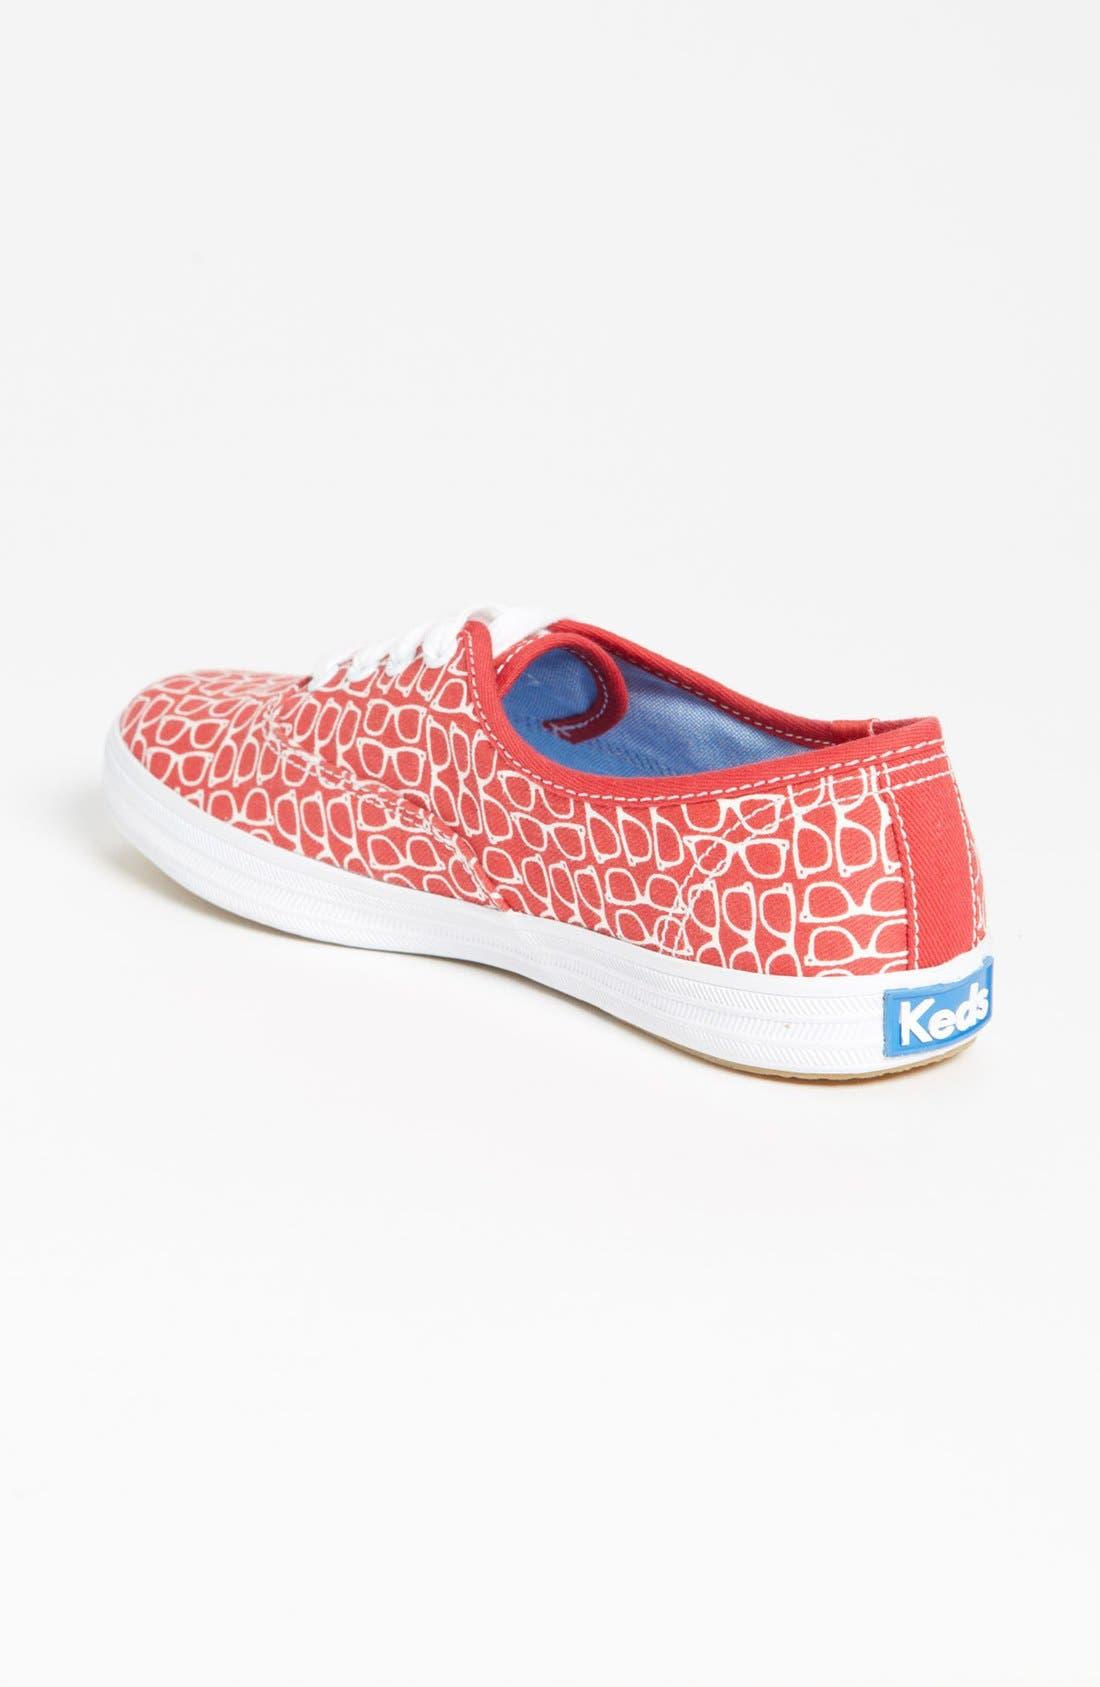 Taylor Swift Champion Sneaker,                             Alternate thumbnail 4, color,                             600